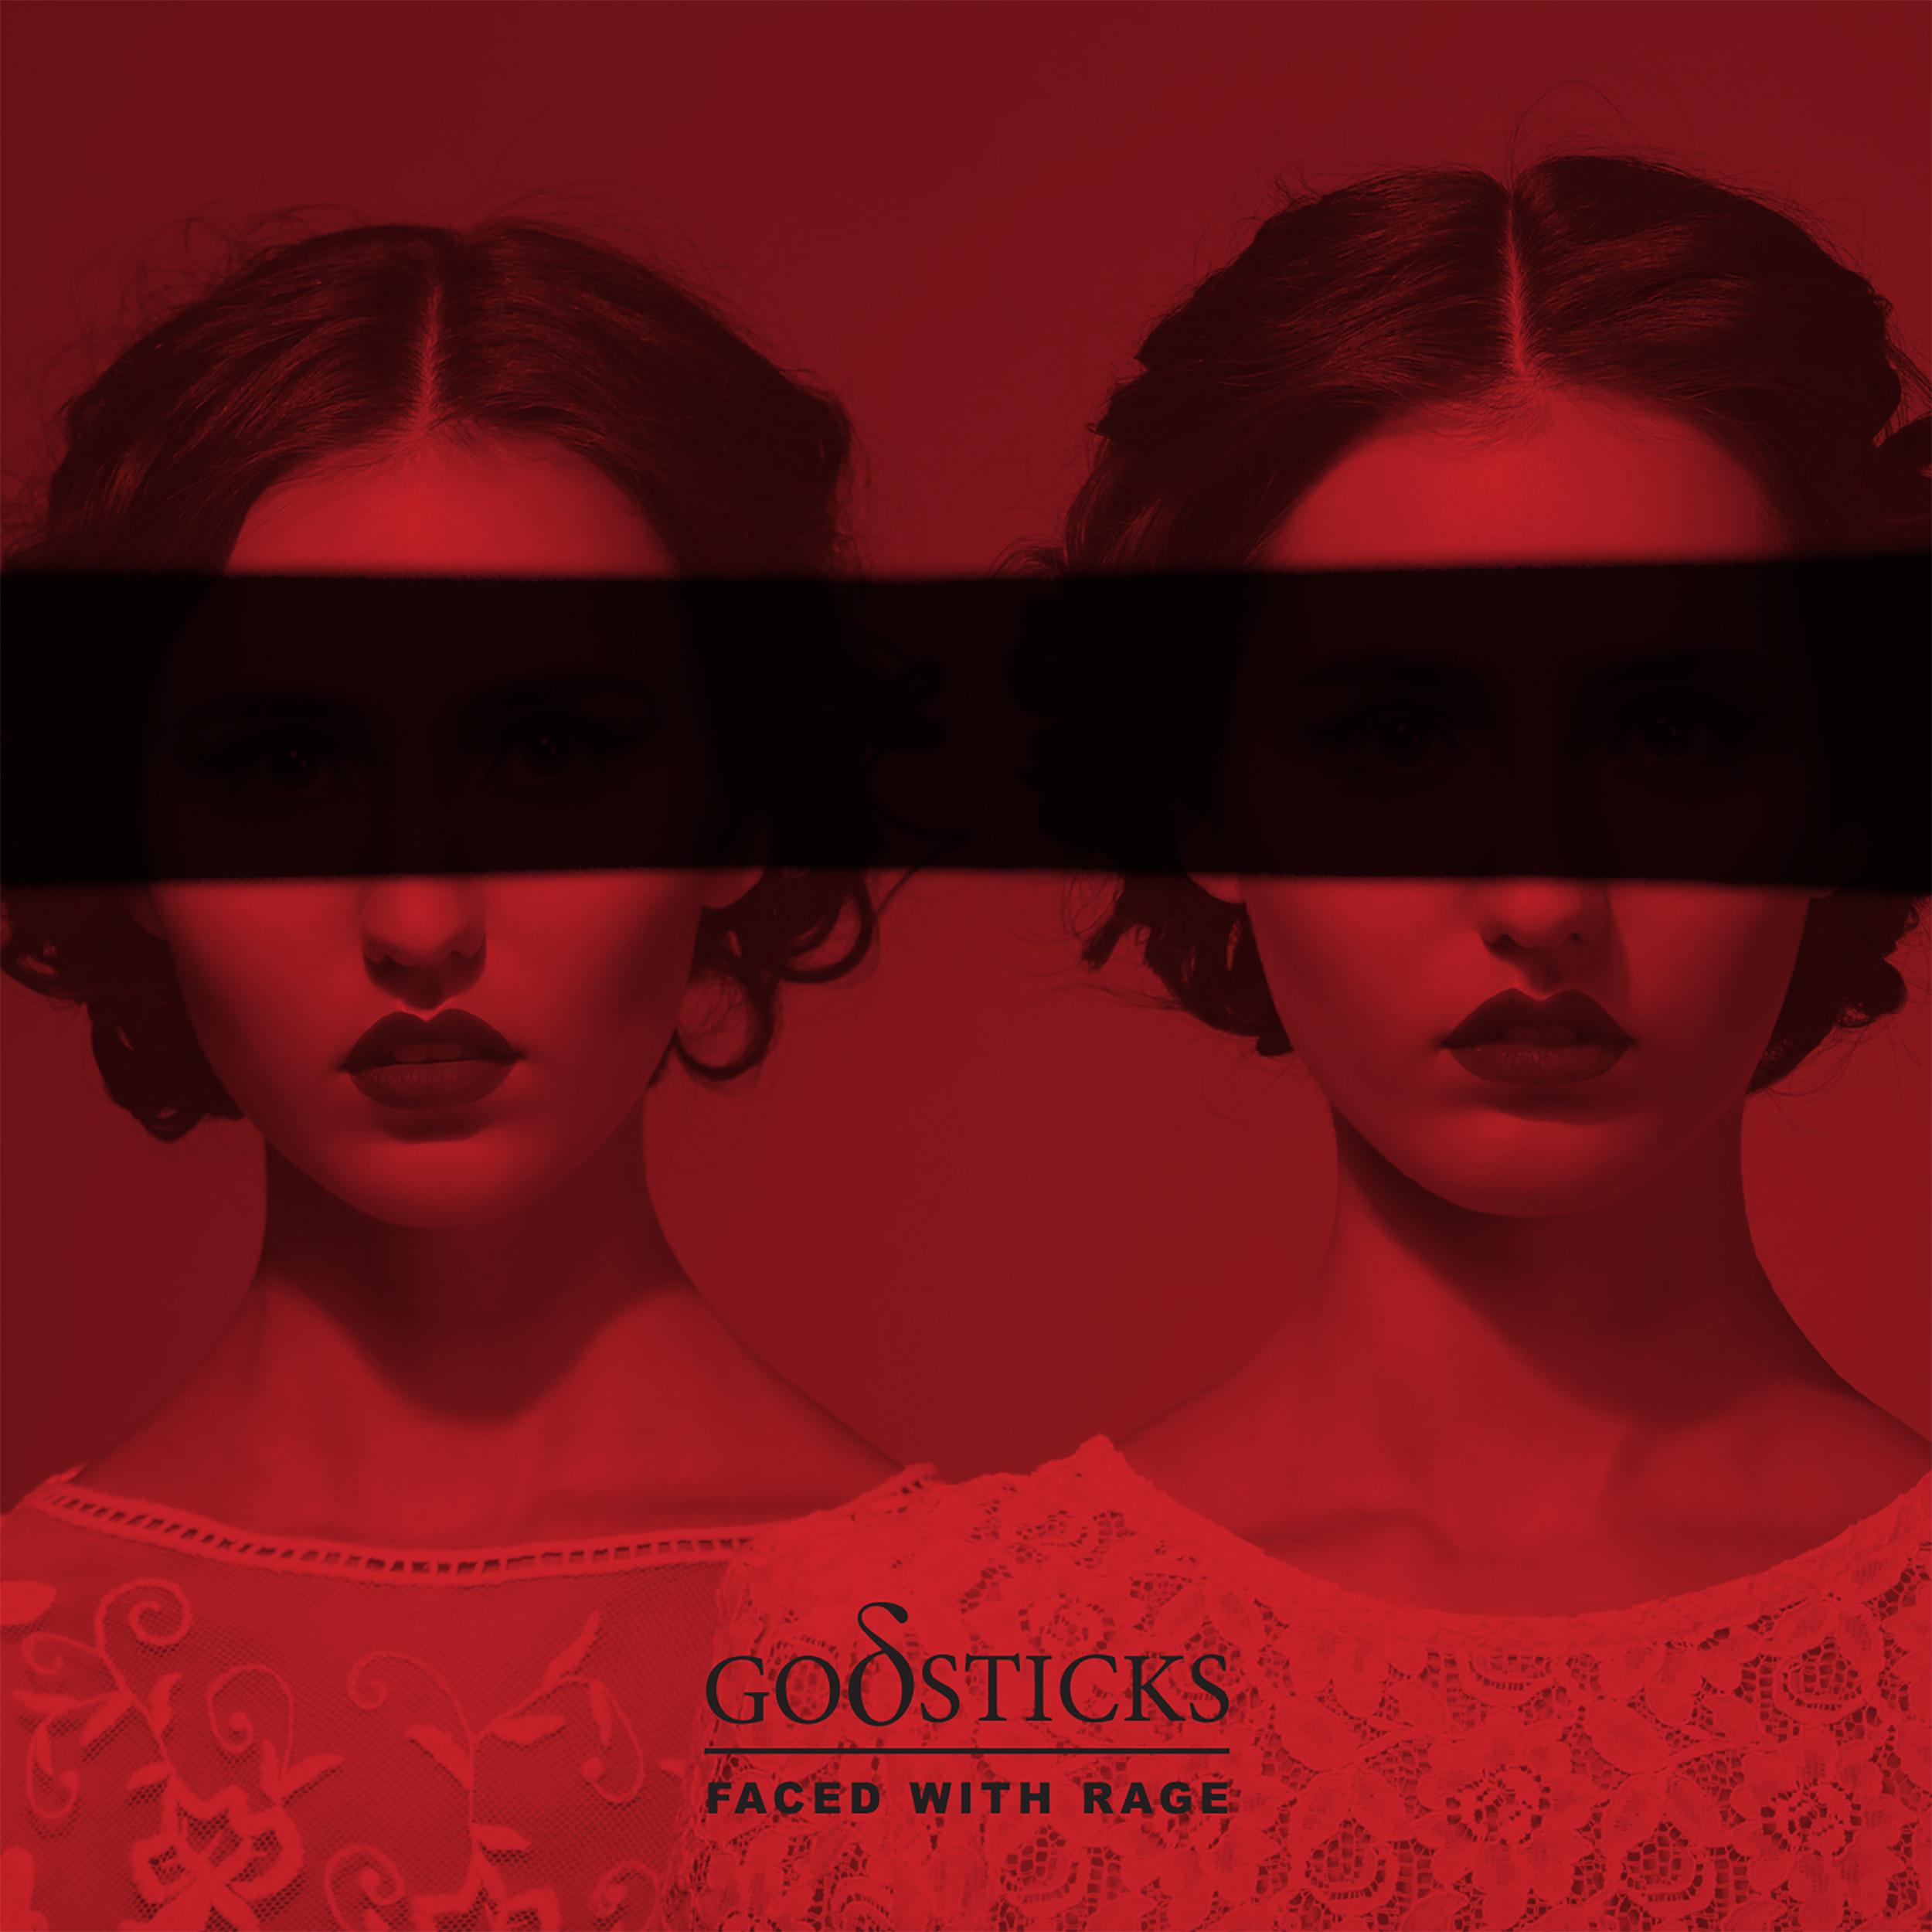 Godsticks – Faced With Rage